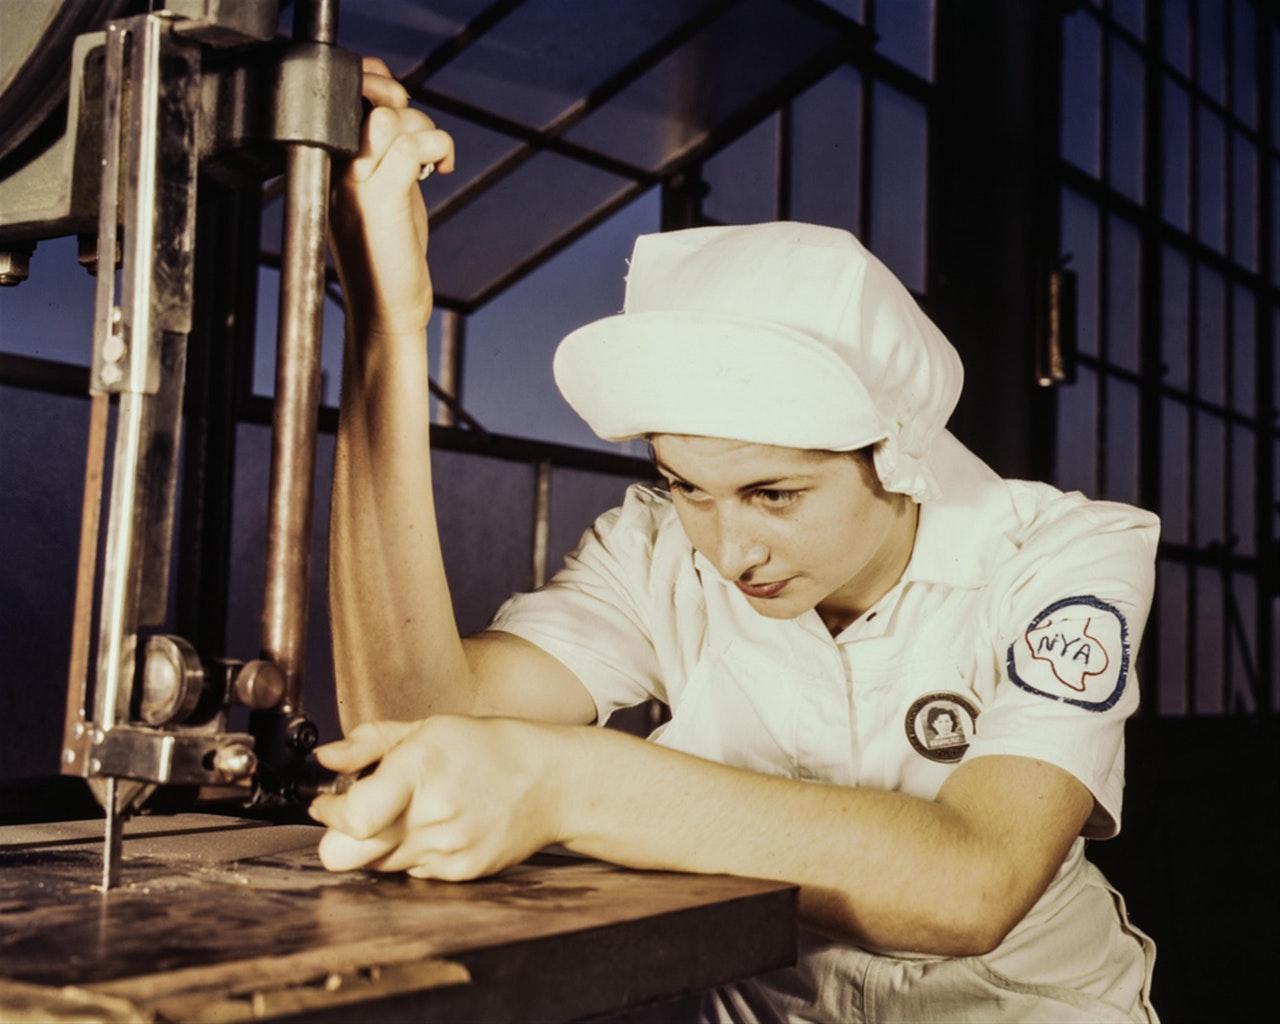 kobieta skupiona na pracy